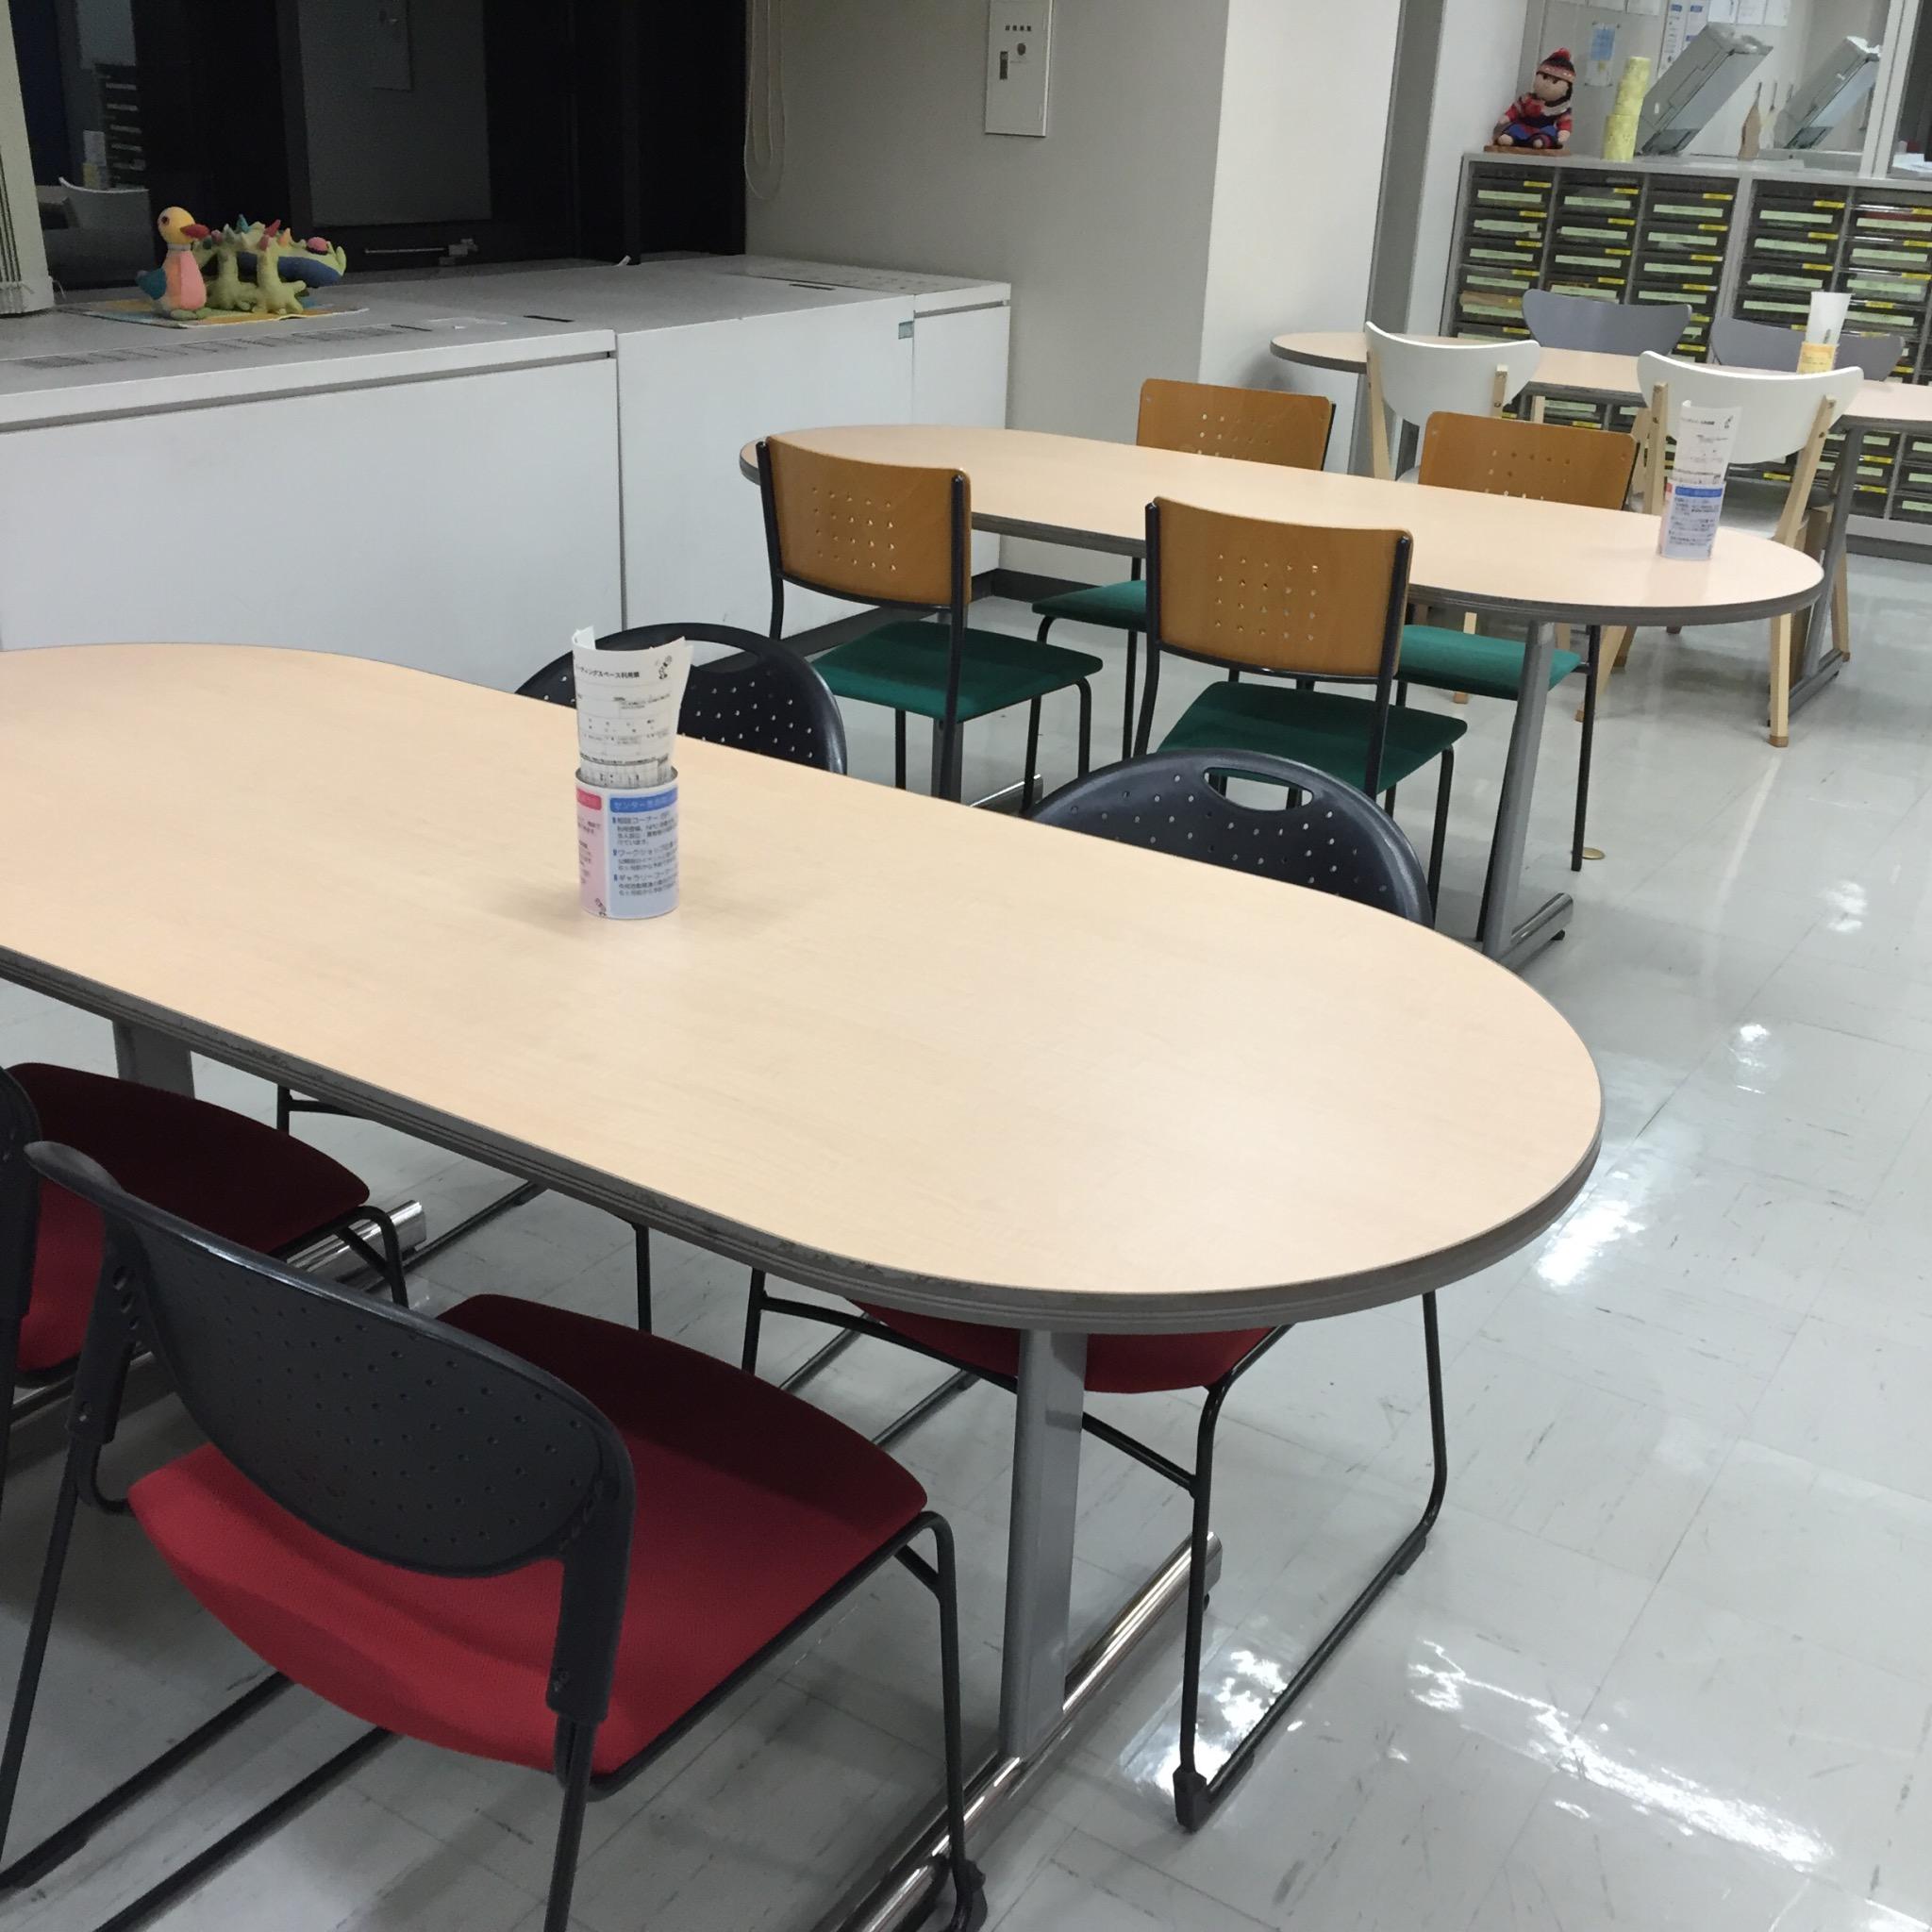 横浜市市民活動支援センター打合せ